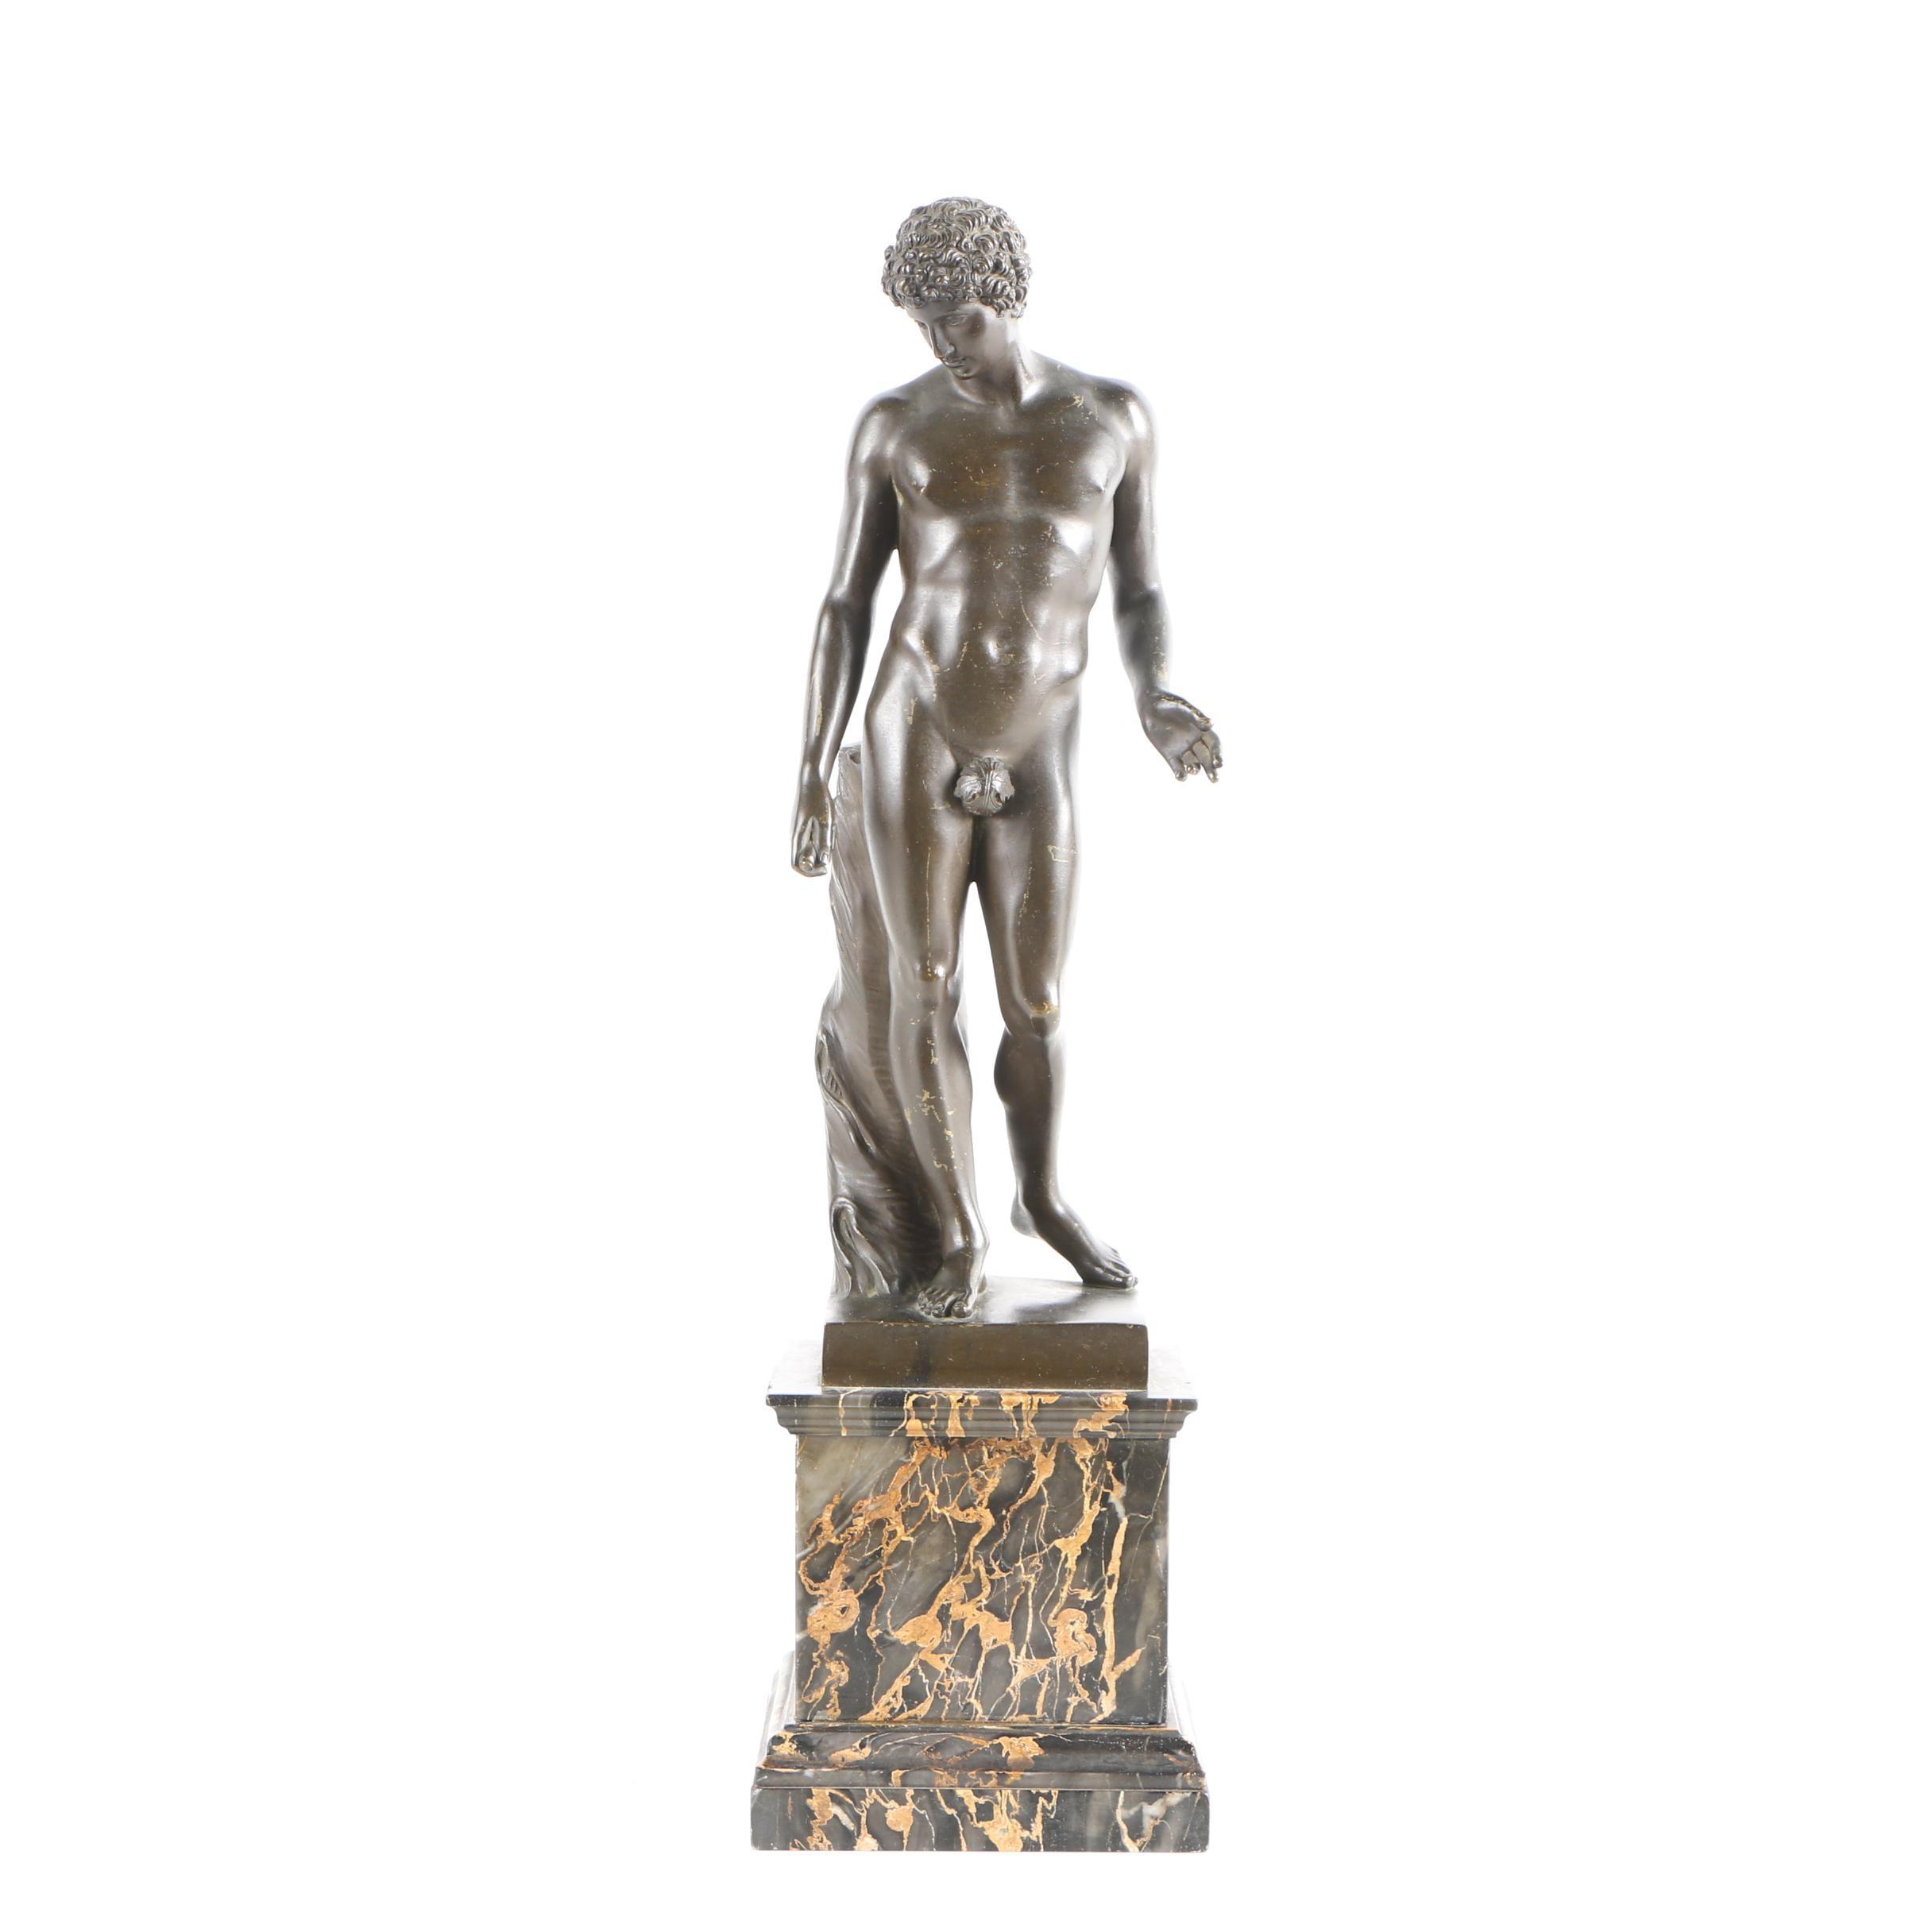 Copper Sculpture of Grecian Style Figure